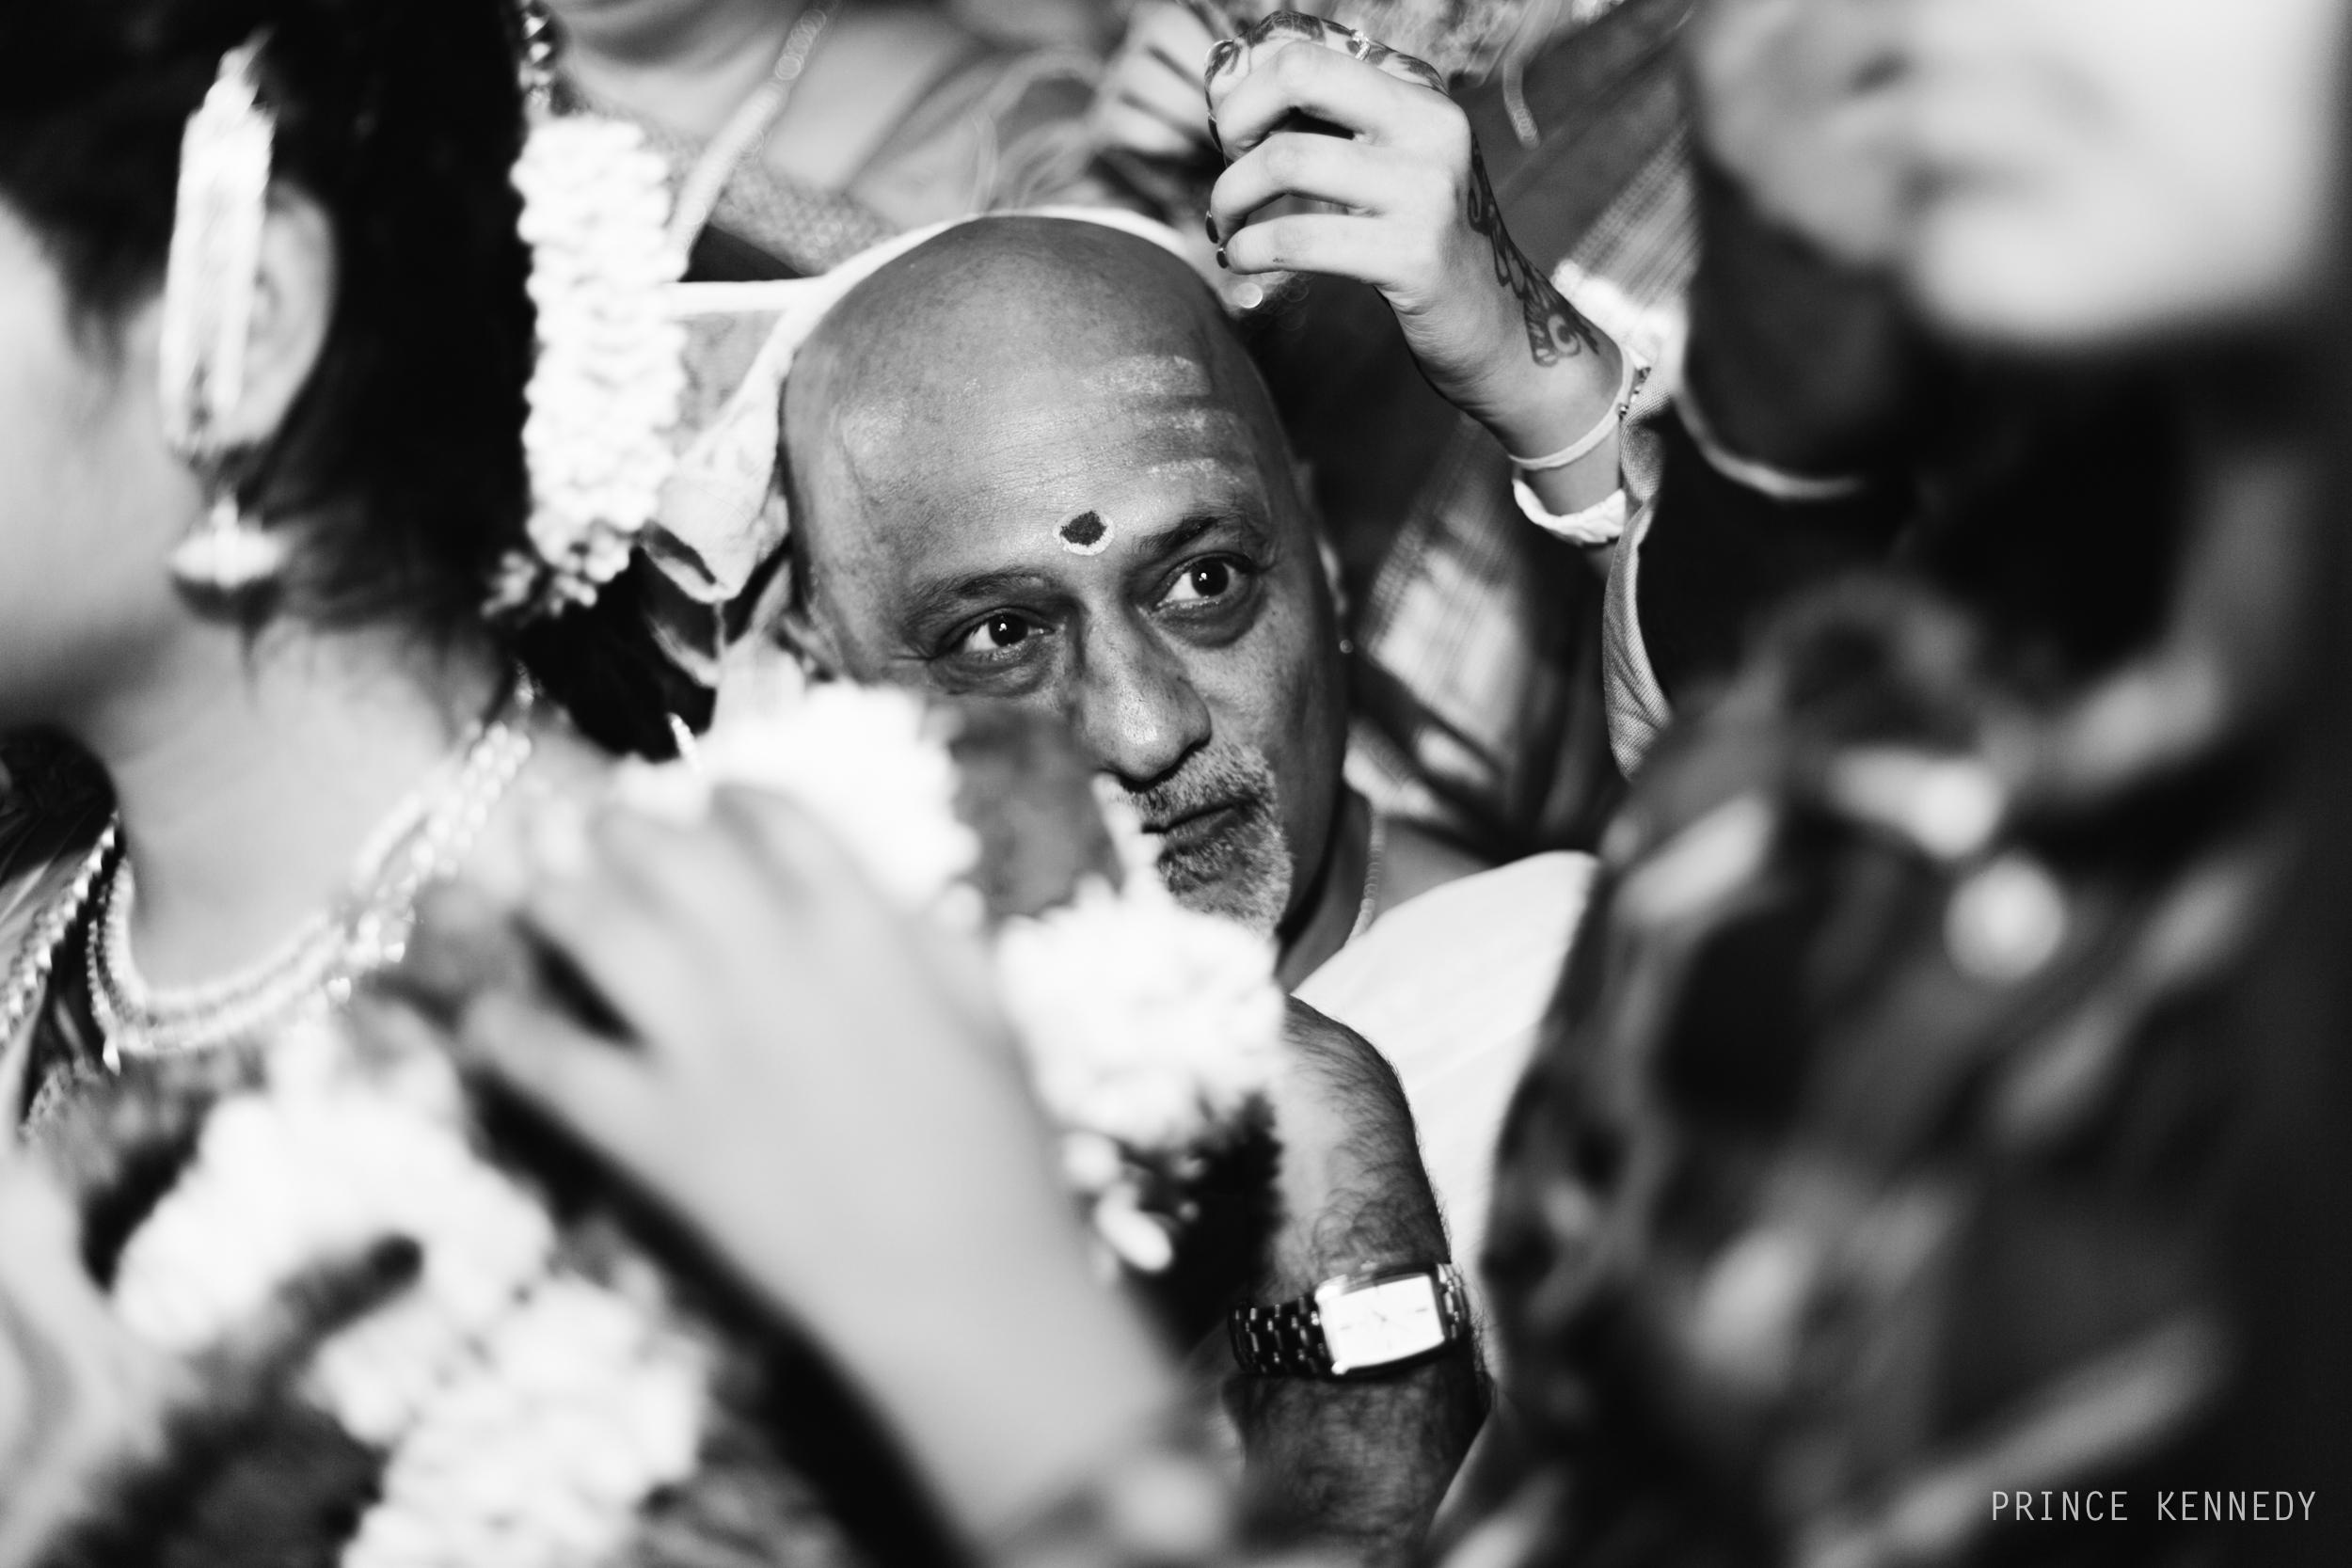 Athmajja-Nithesh-Engagement-Couple-Portrait-Portraiture-Wedding-Couple-Portrait-Chennai-Photographer-Candid-Photography-Destination-Best-Prince-Kennedy-Photography-286.jpg